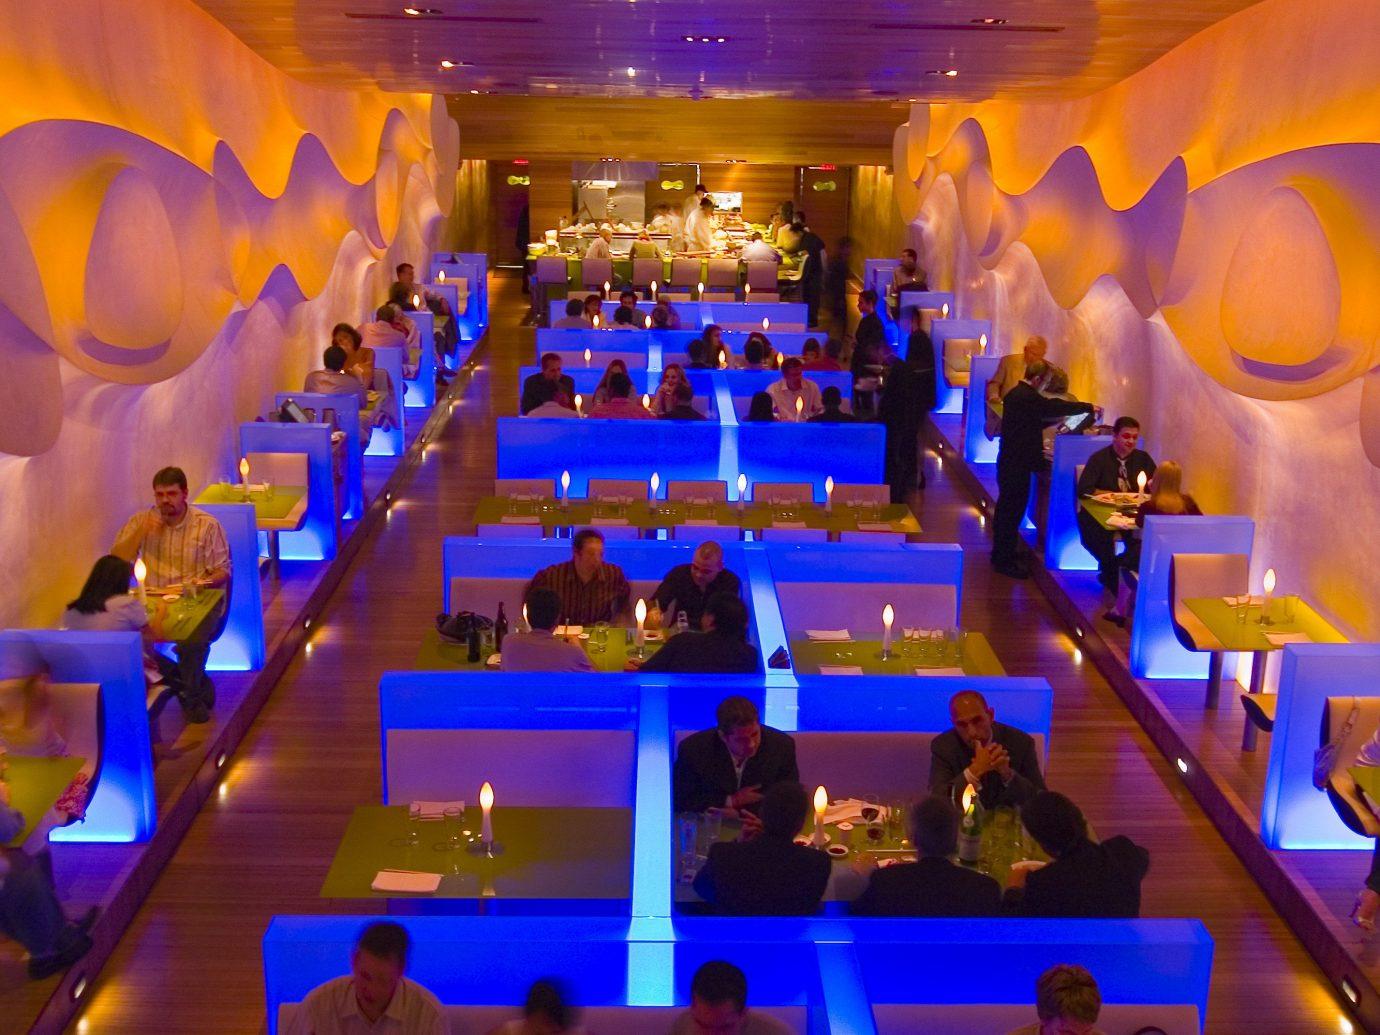 Food + Drink indoor function hall stage ceremony musical theatre Resort ballroom auditorium